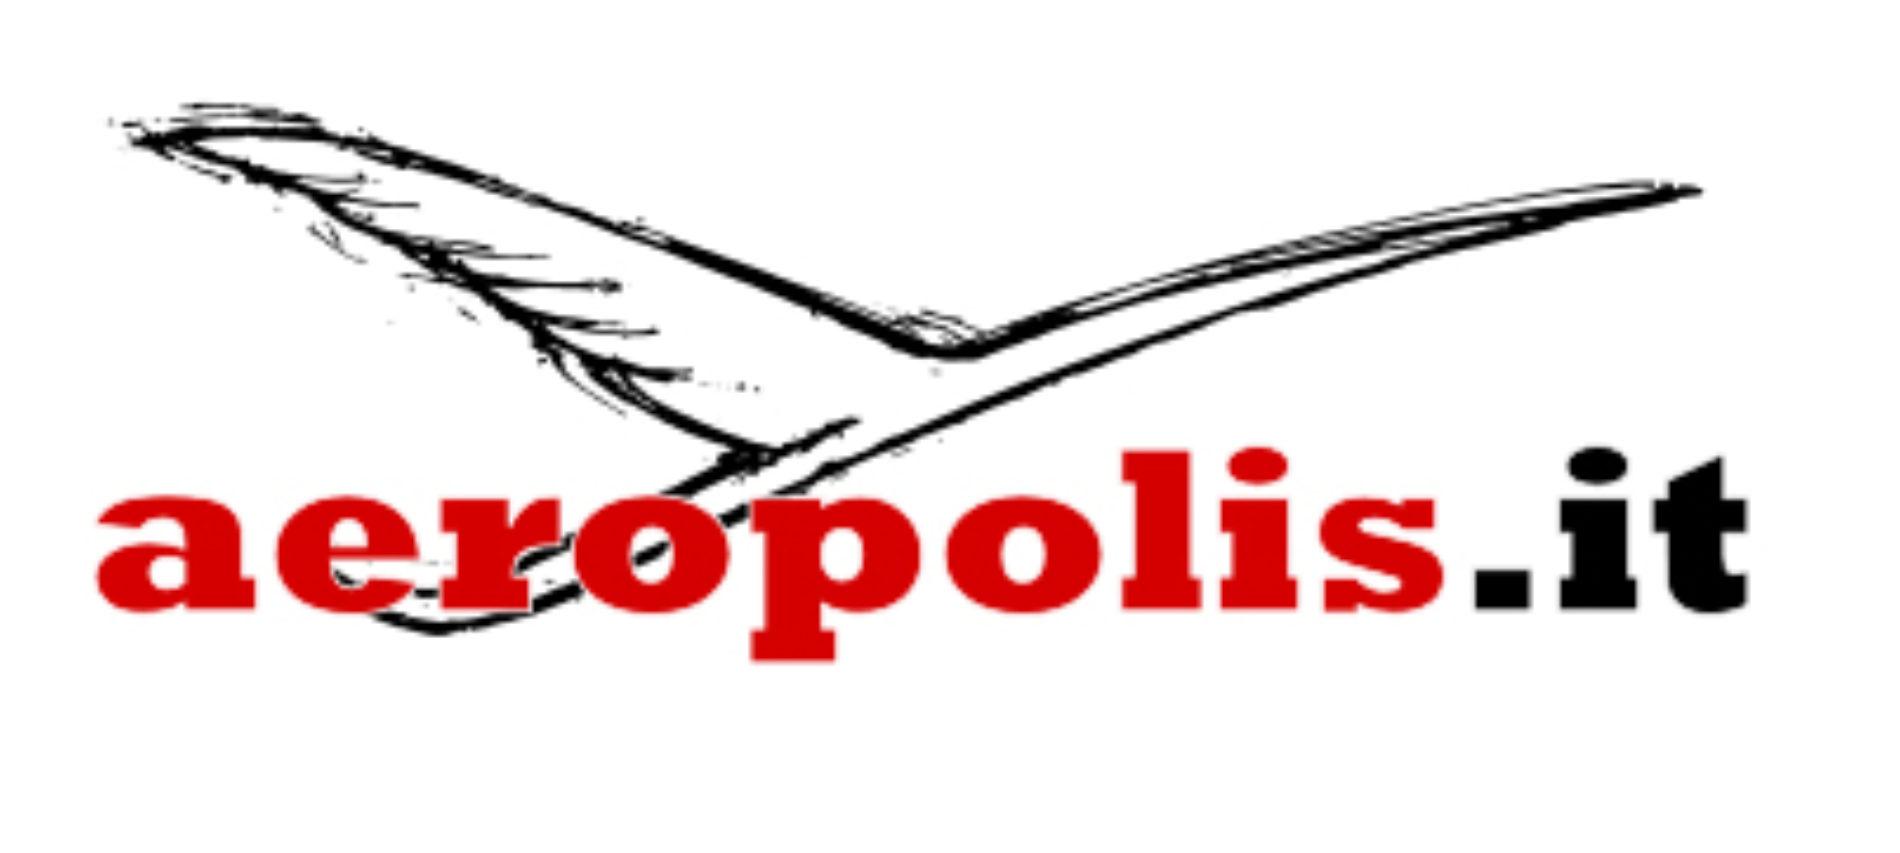 cropped-logo_aeropolis_bagliore-2.jpg